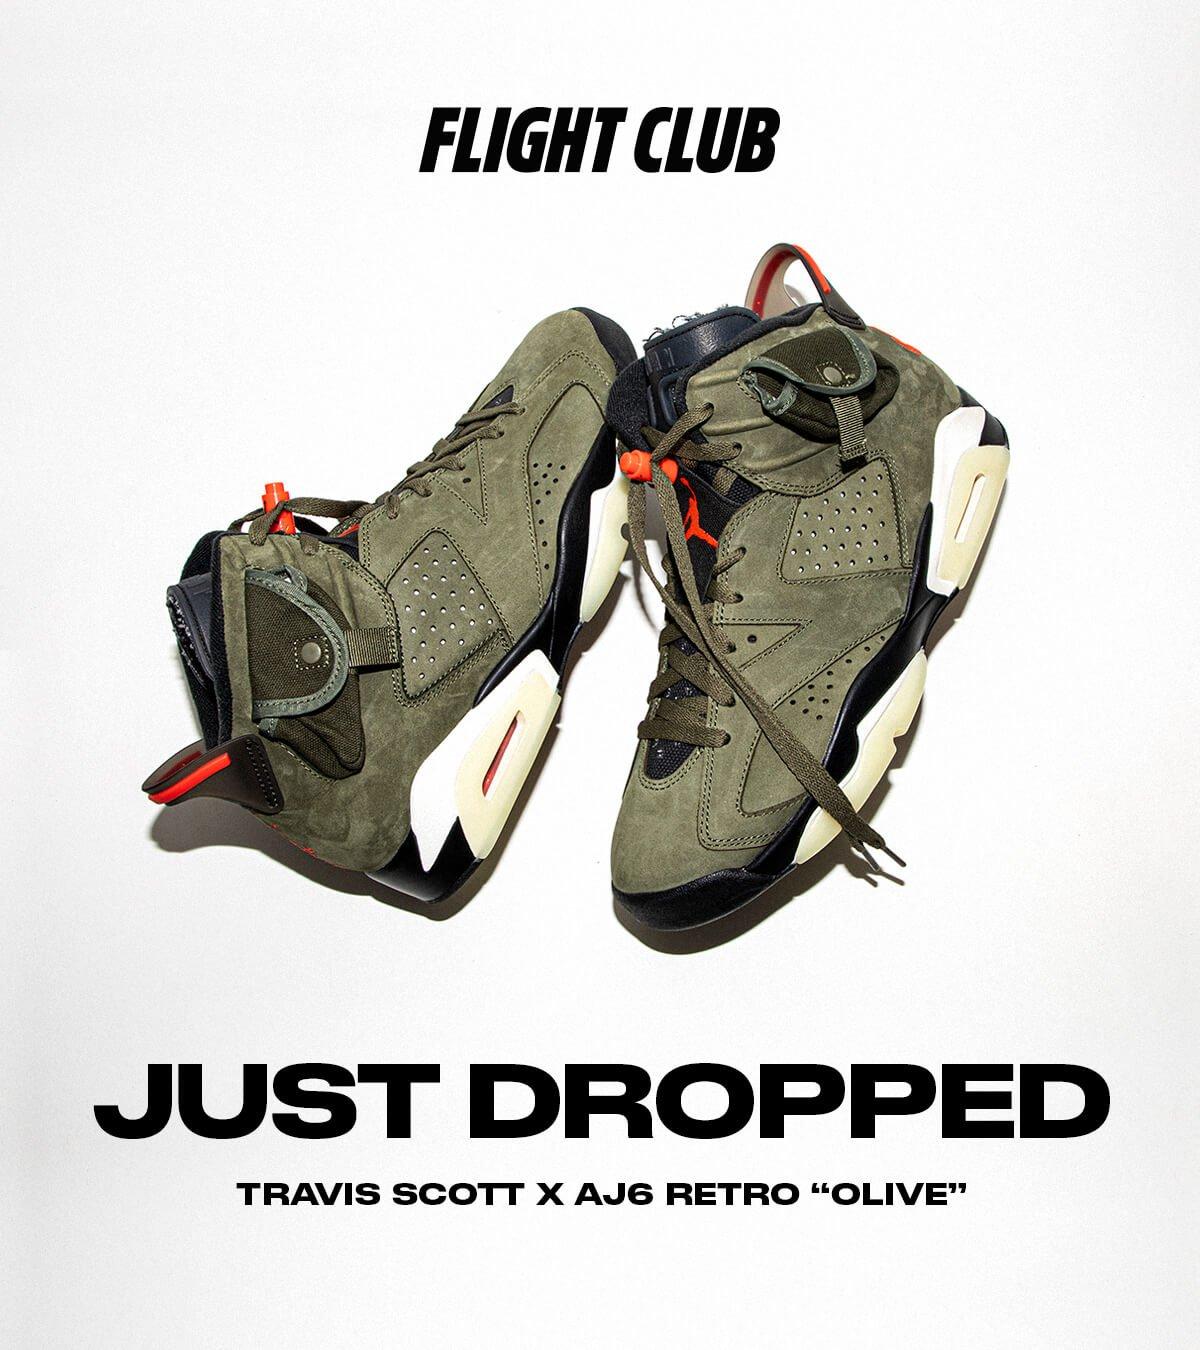 Travis Scott x Air Jordan 6 available